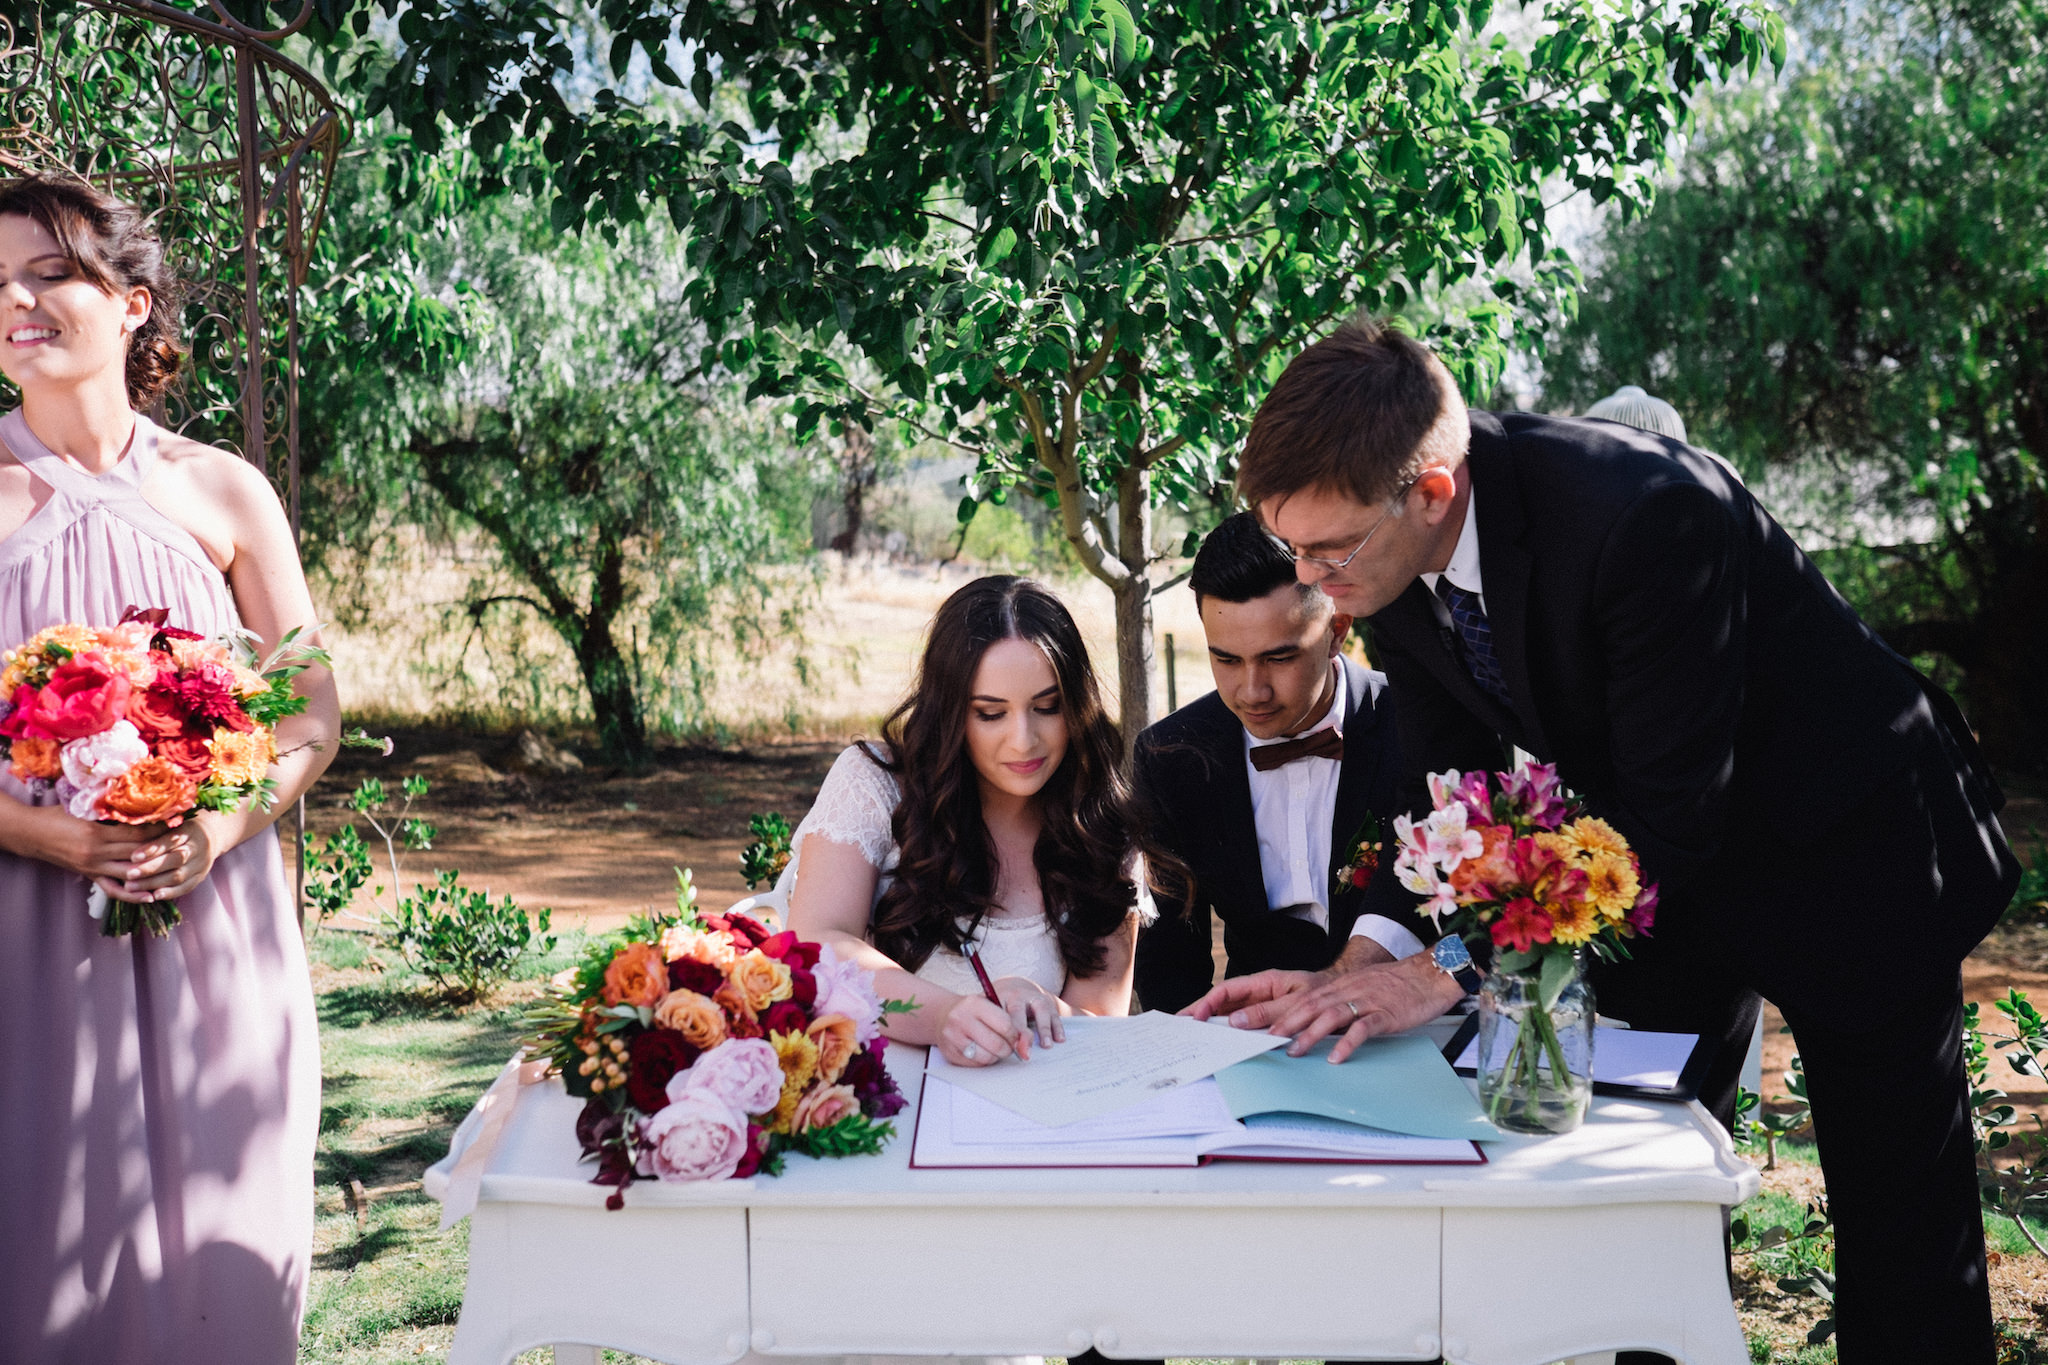 Laurelville Manor Ceremony Sarah Marvin York Wedding Photographer 16